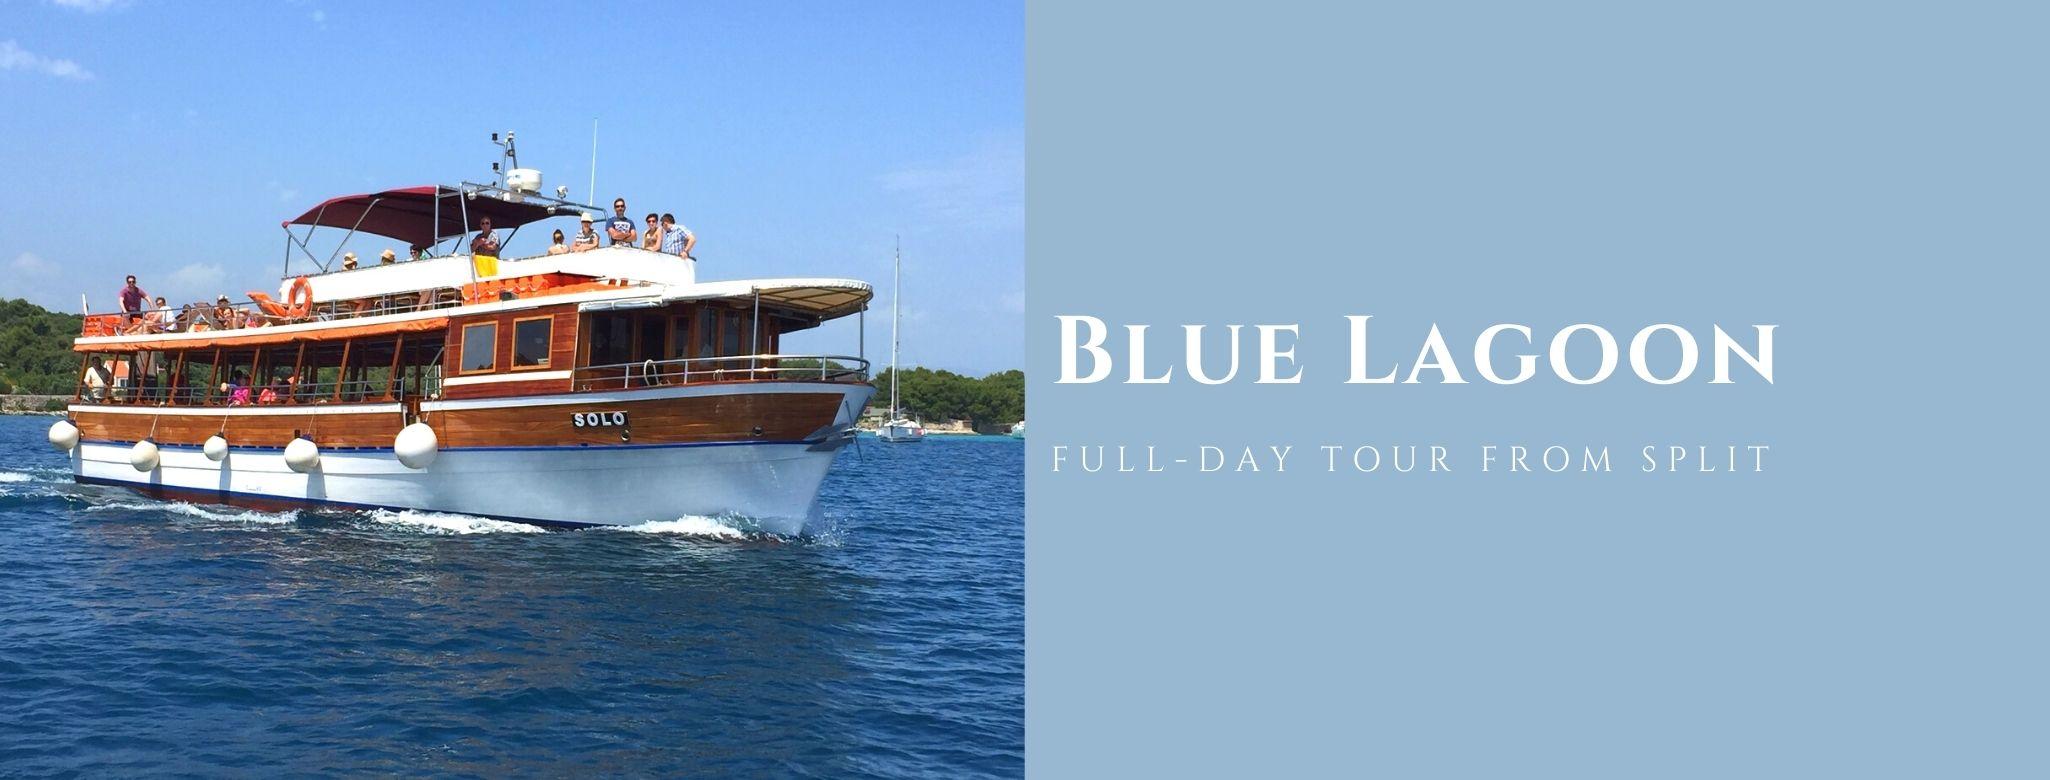 Blue Lagoon full day